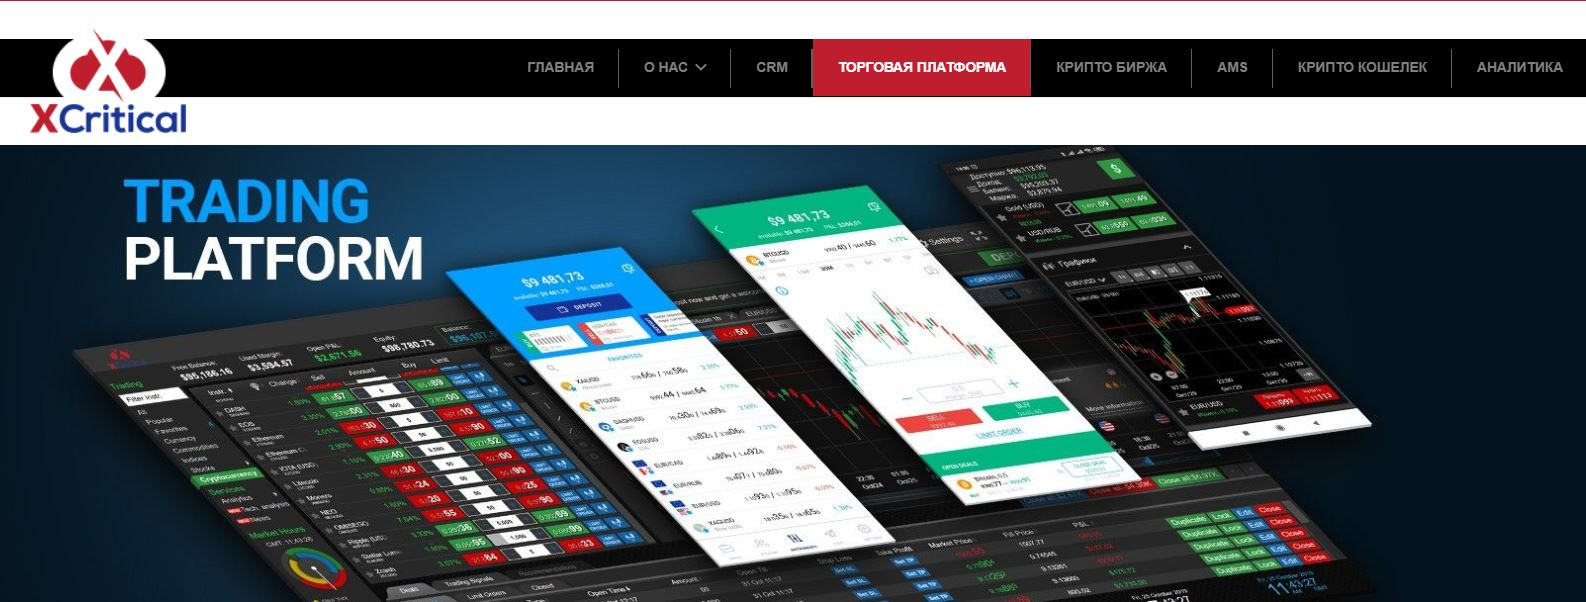 xcritical торговая платформа